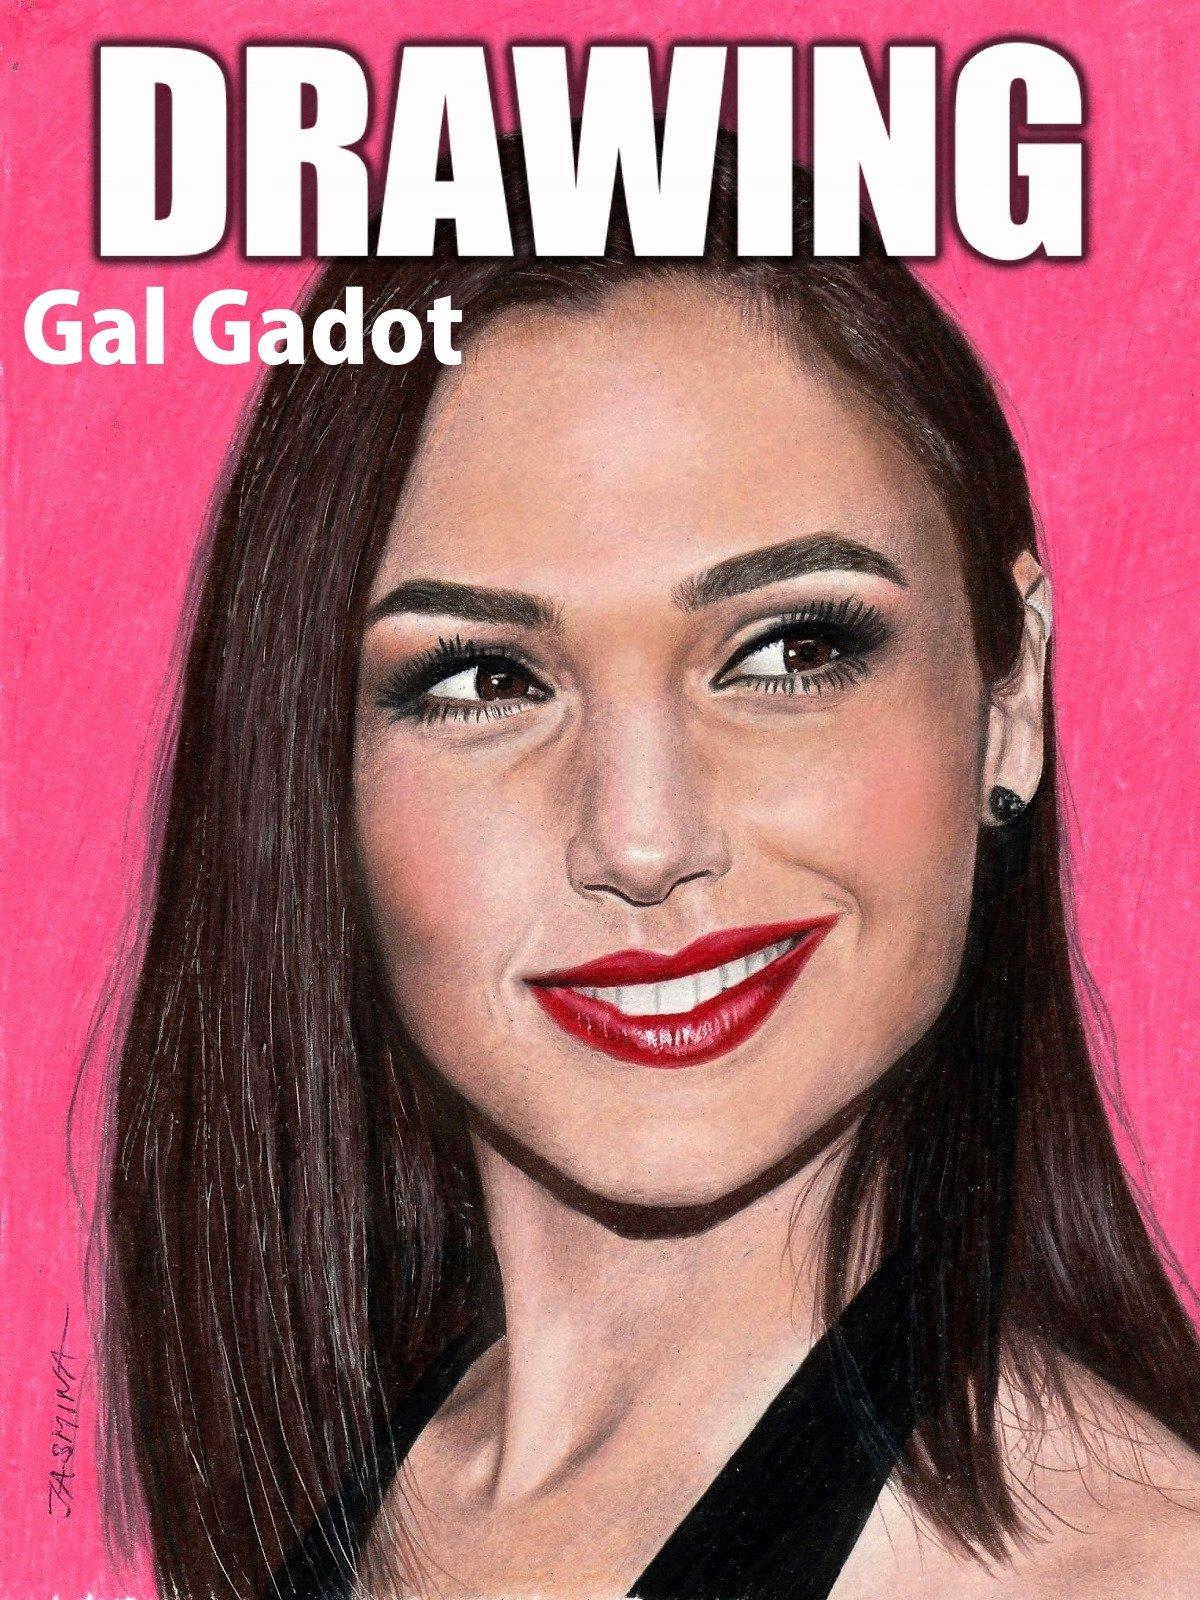 Clip: Drawing Gal Gadot